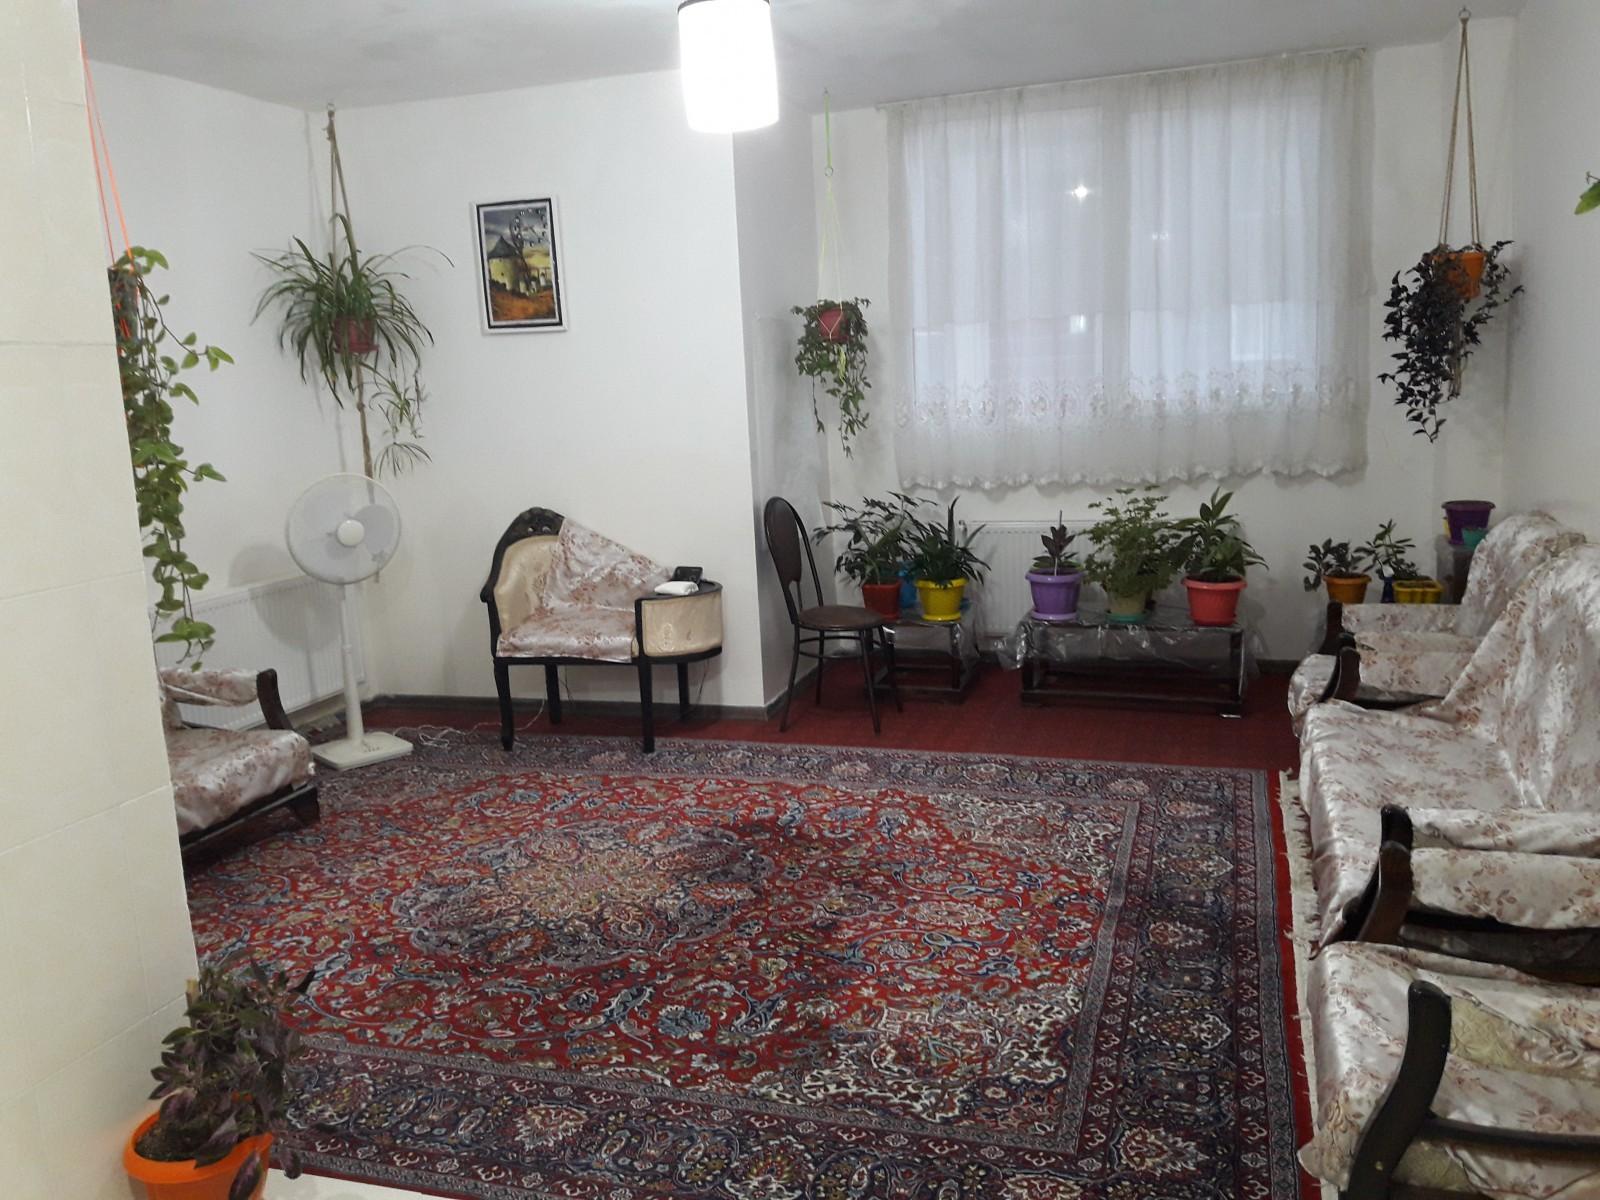 Countryside سوئیت دربستی در خوانسار اصفهان